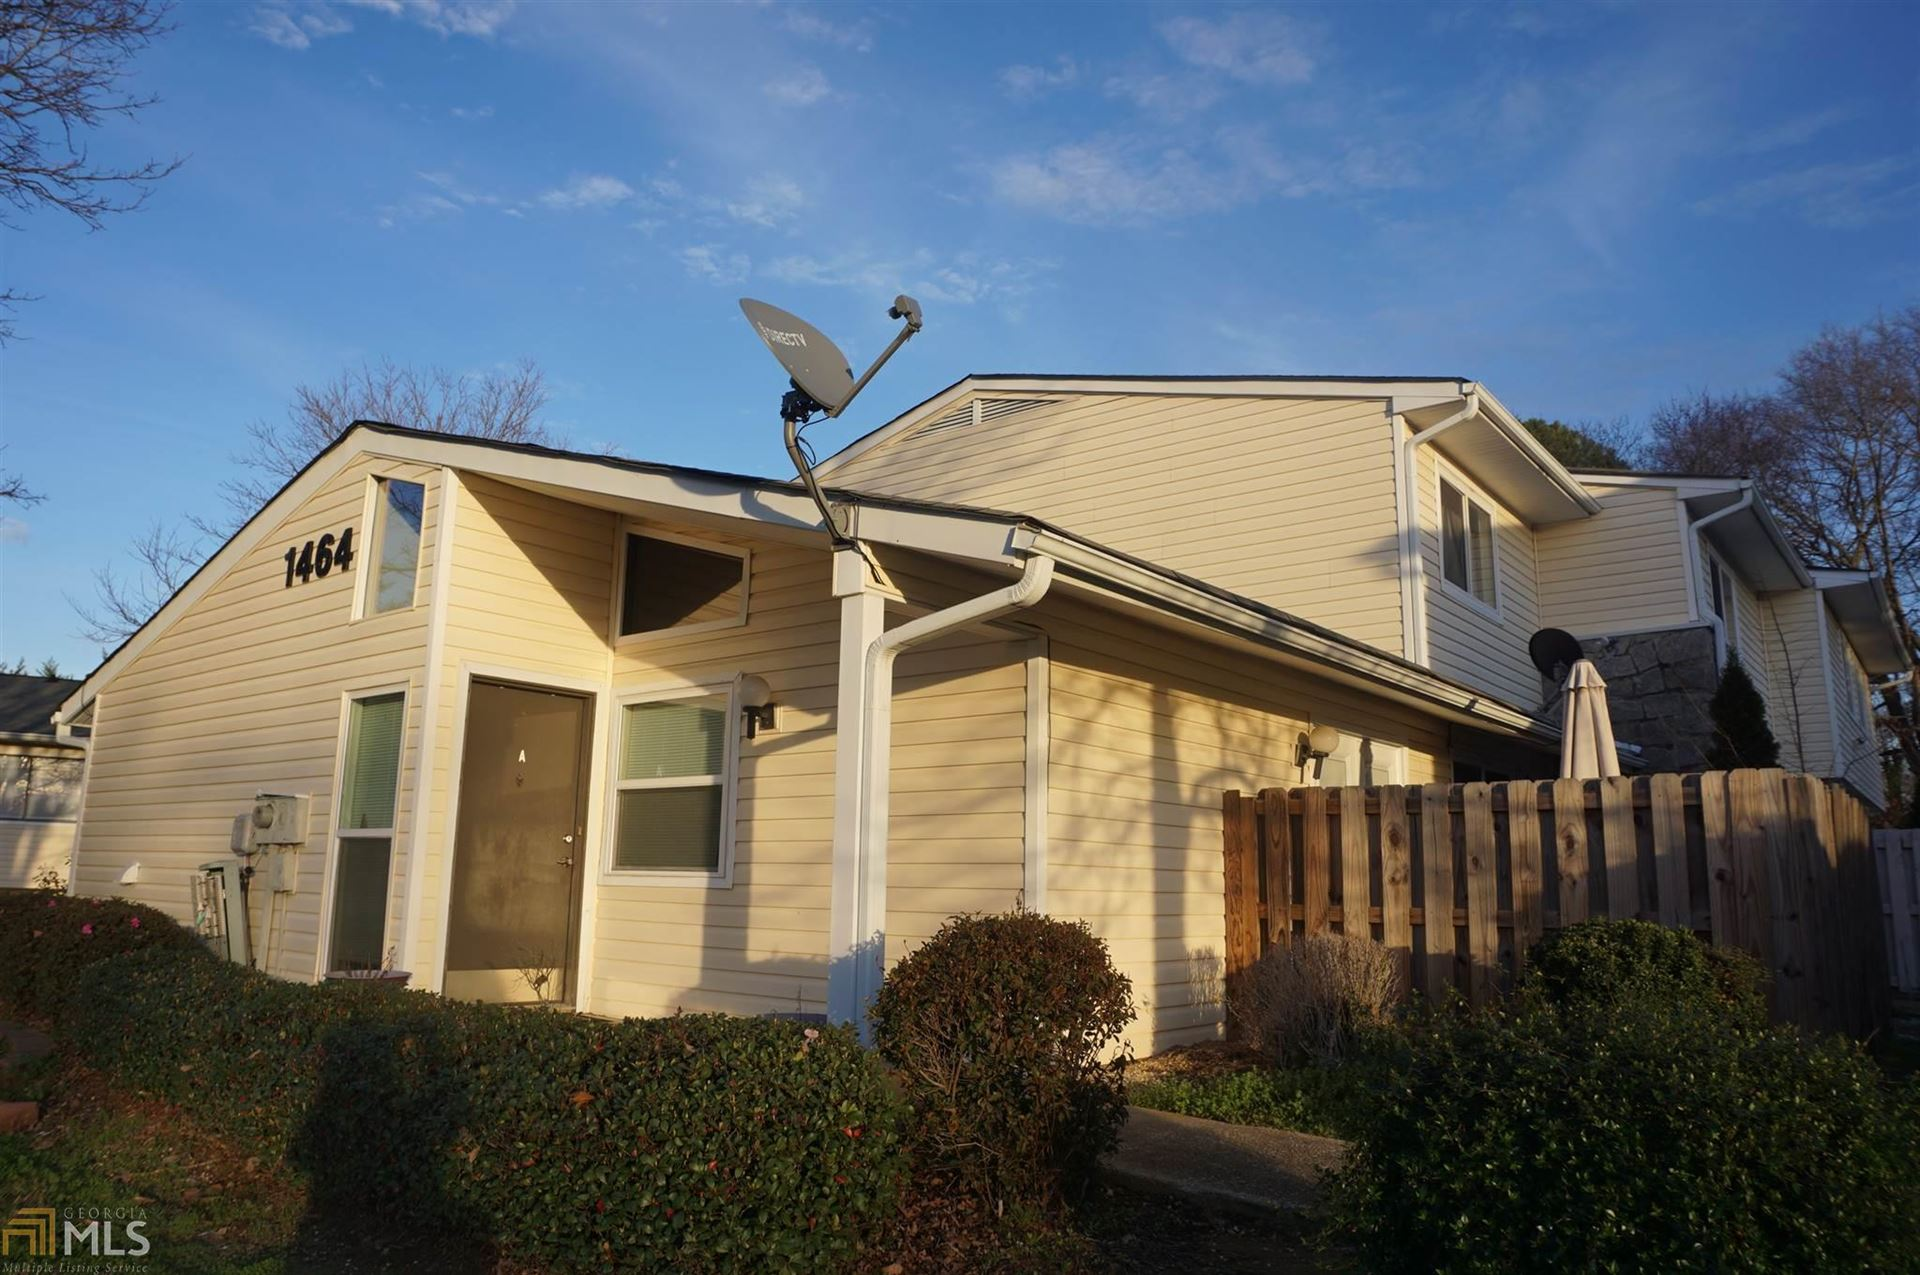 1464 Pine Log Rd, Conyers, GA 30012 - MLS#: 8721909